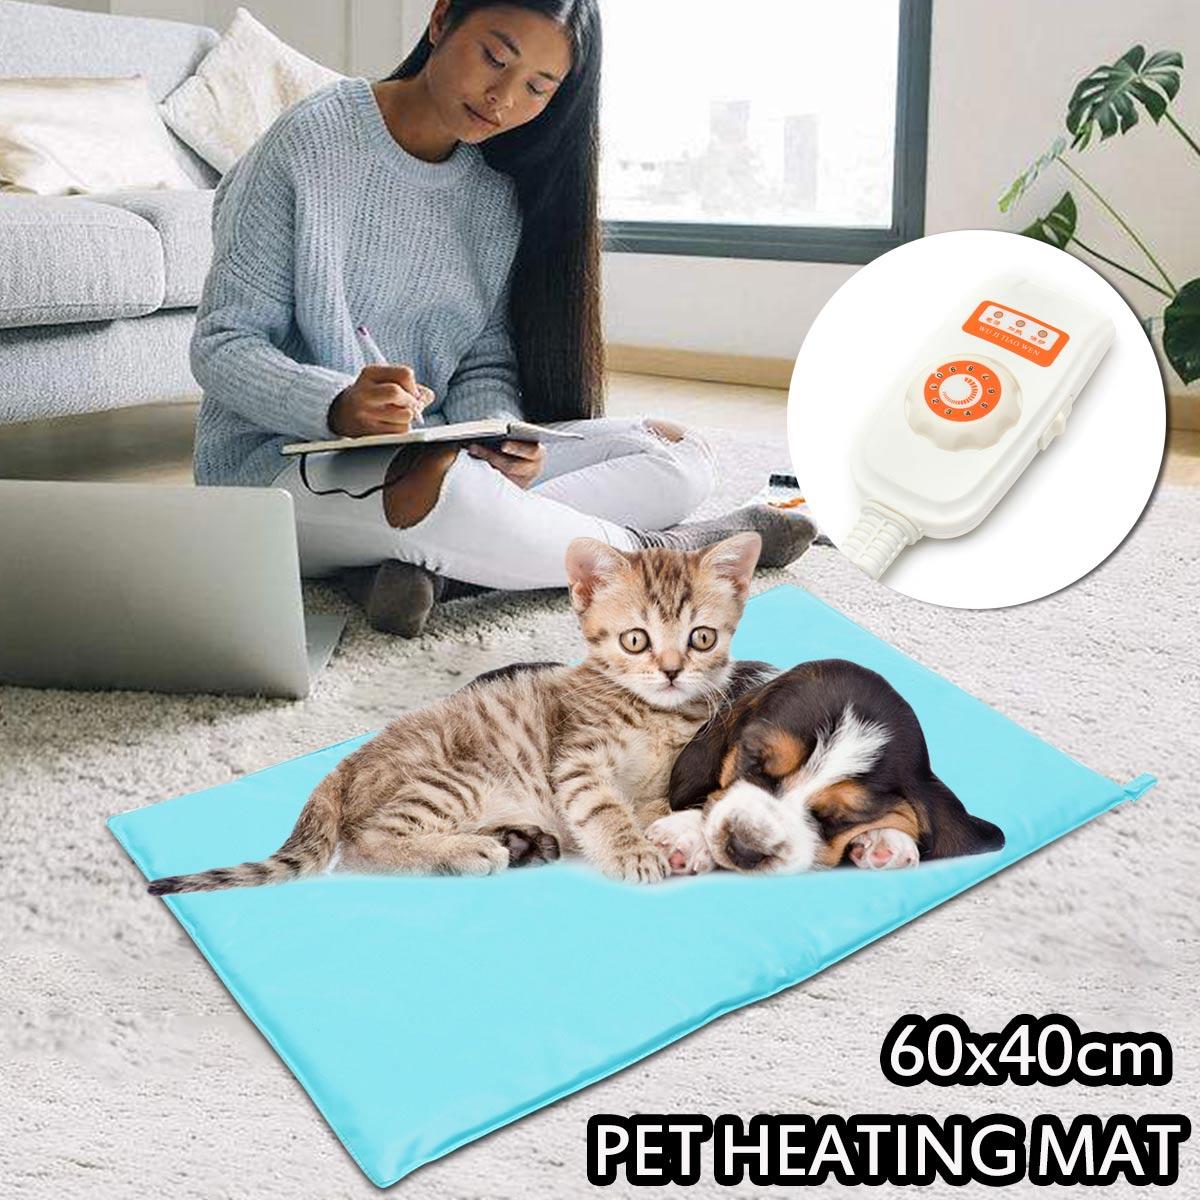 30W 10 Level Electric Heater Pad Adjust Pet Heating Mat Waterproof Warming Winter Pad Dog Cat Bed 60x40cm